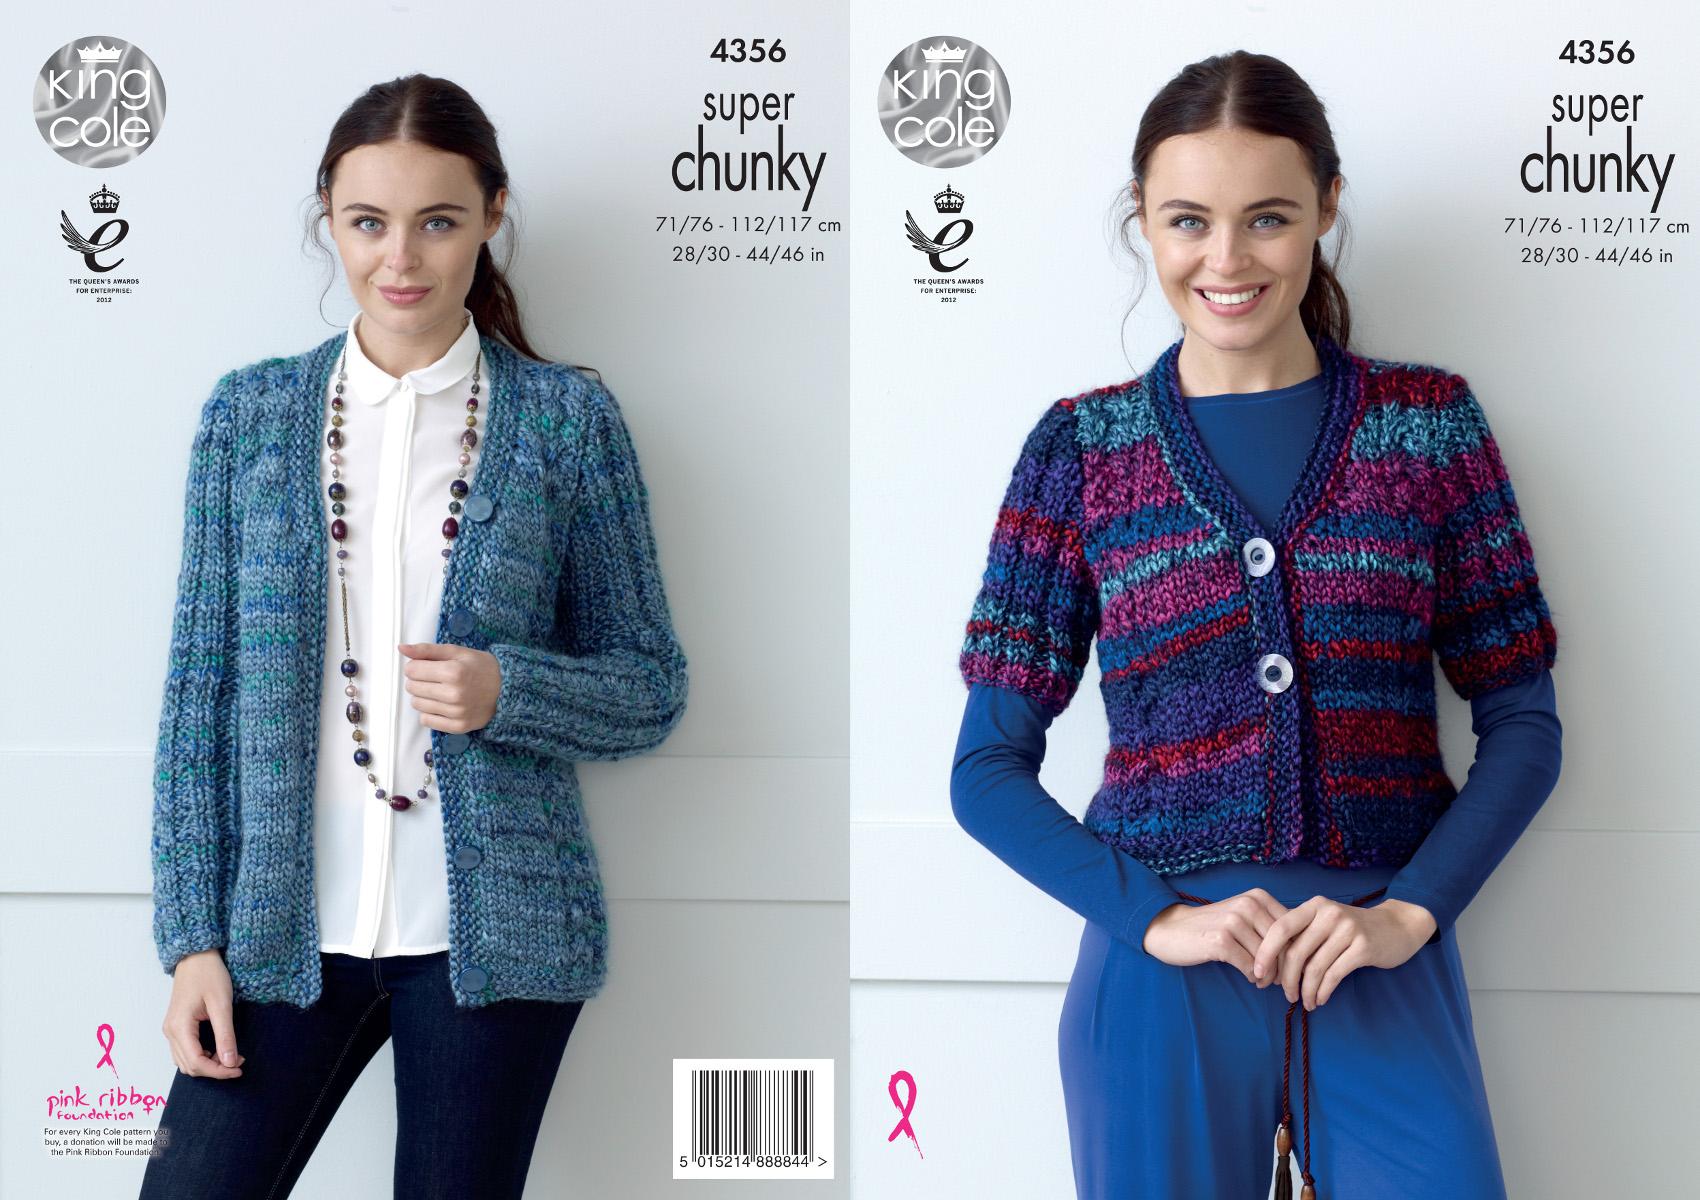 King Cole Ladies Super Chunky Knitting Pattern Short Long Sleeve ...